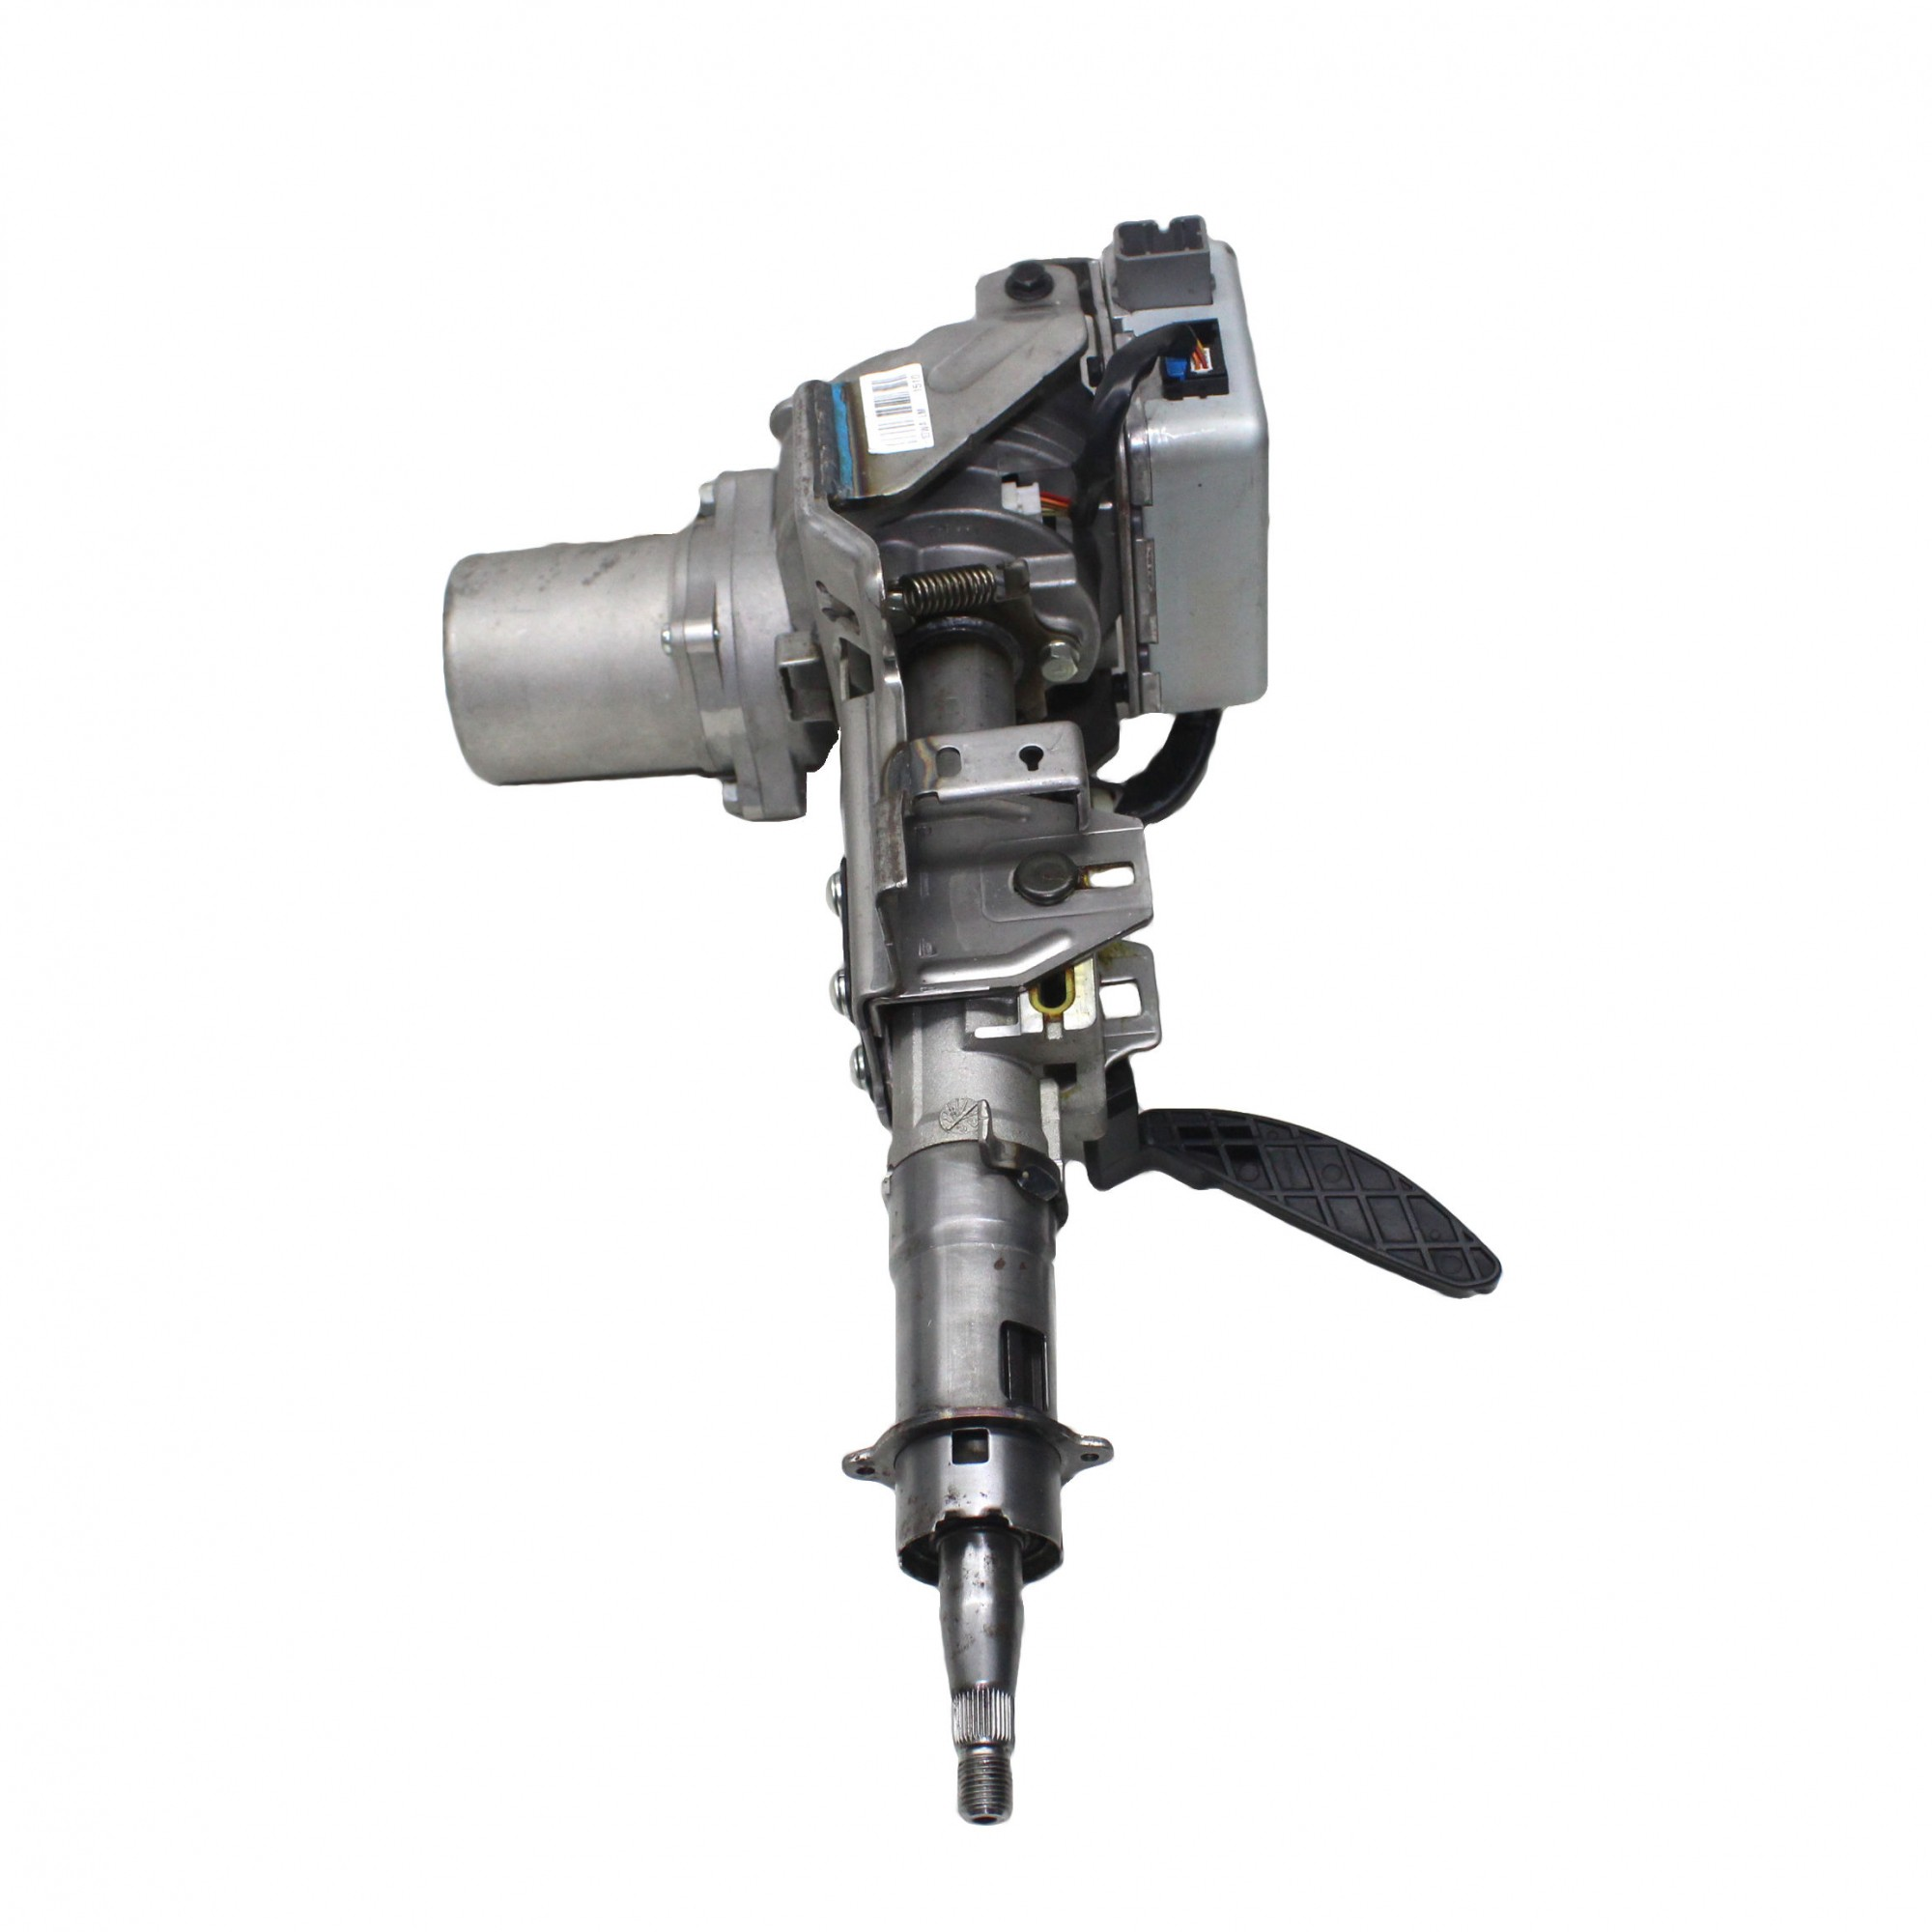 Motor Coluna Direção Elétrica Hyundai IX35 13..., Kia Sportage 12...17 563452S511